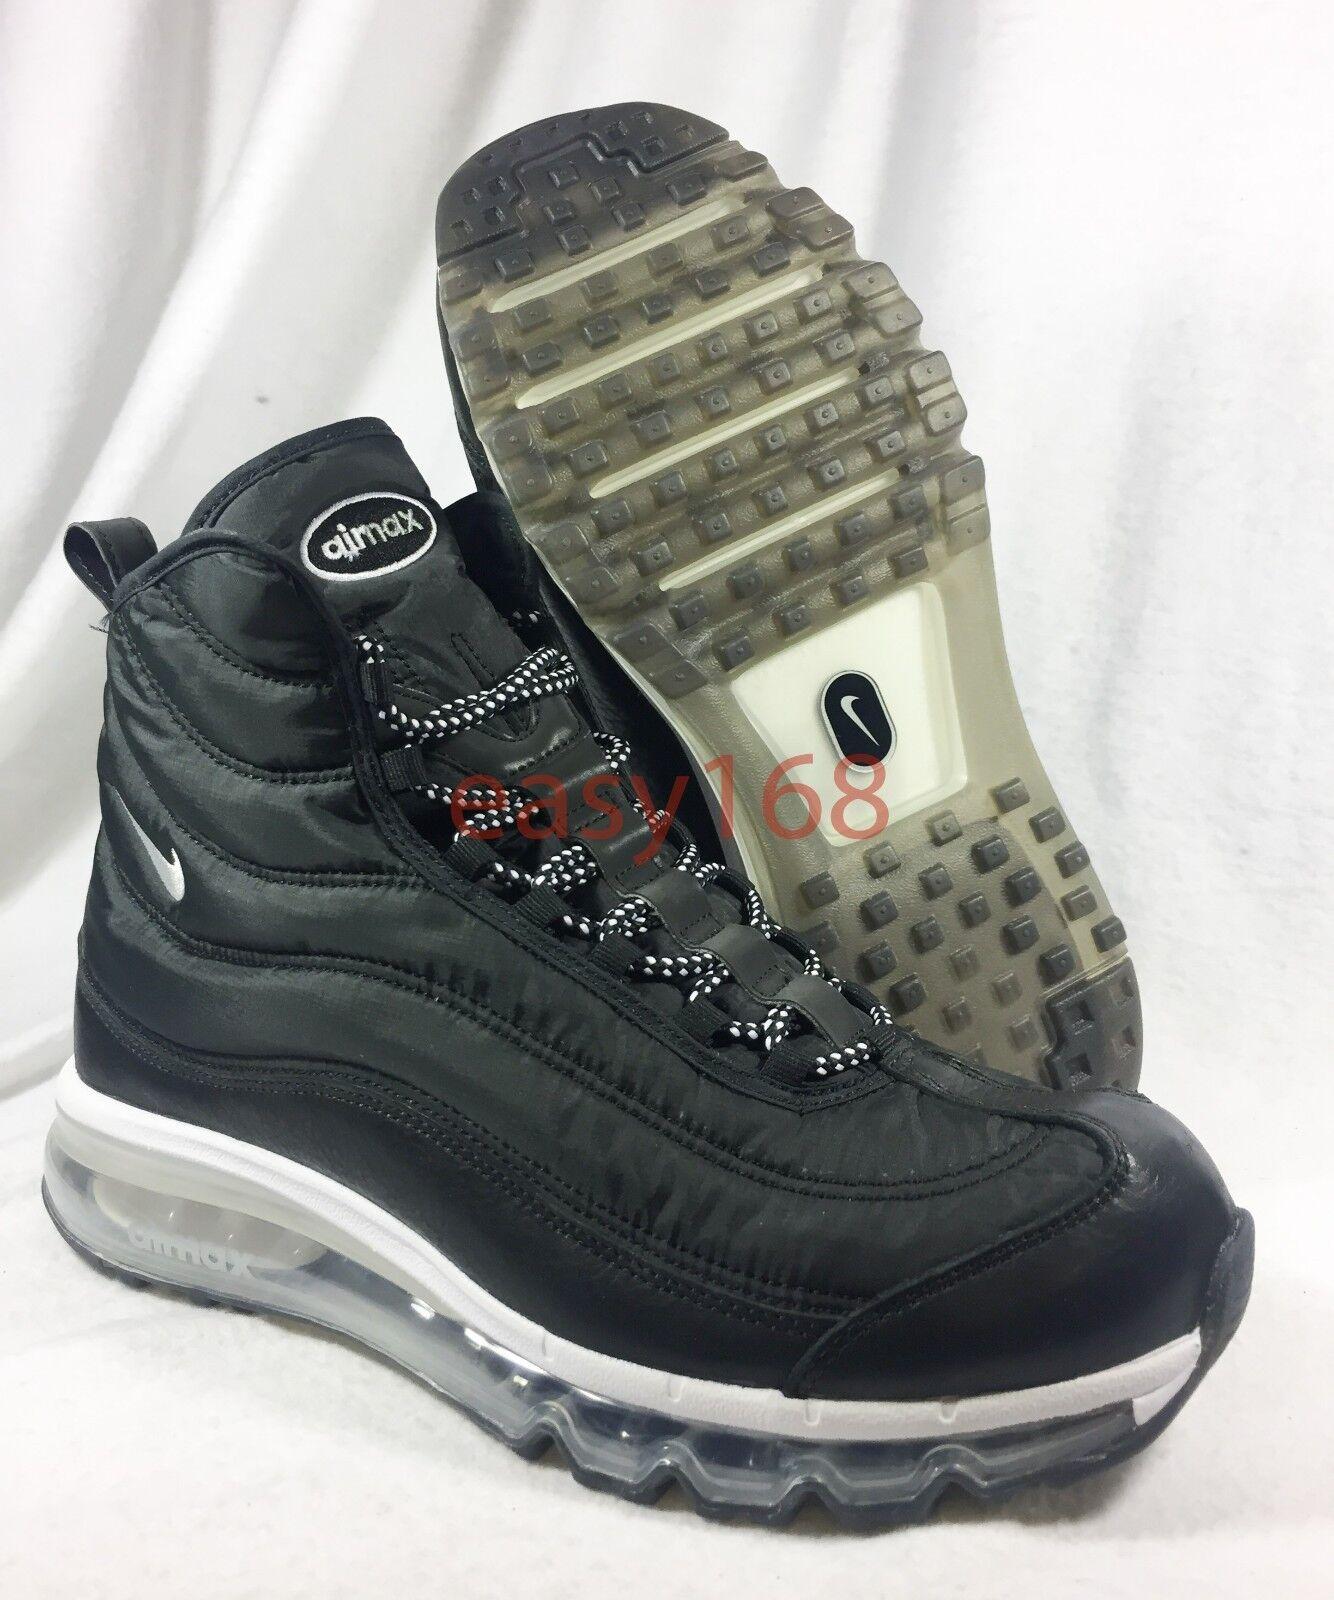 Novedades Nike Air Max Skylynx Sz 9 para hombre 42.5 Botas Negro Invierno 844909-001 ACG 360